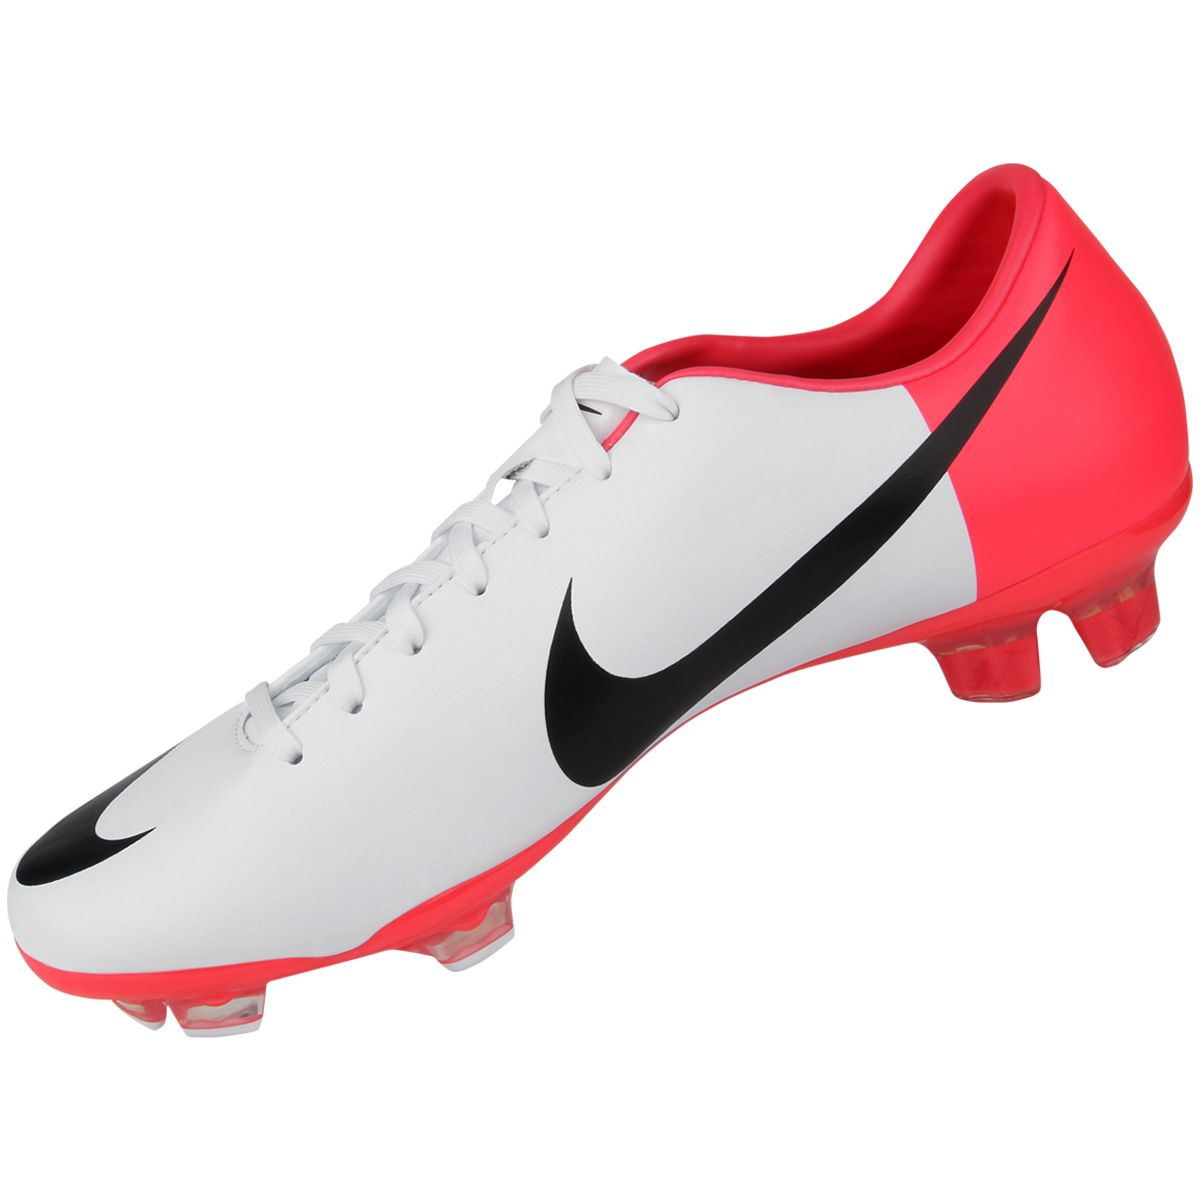 low priced 5838d 7bbf3 Botines Nike Mercurial Glide 3 FG - Netshoes